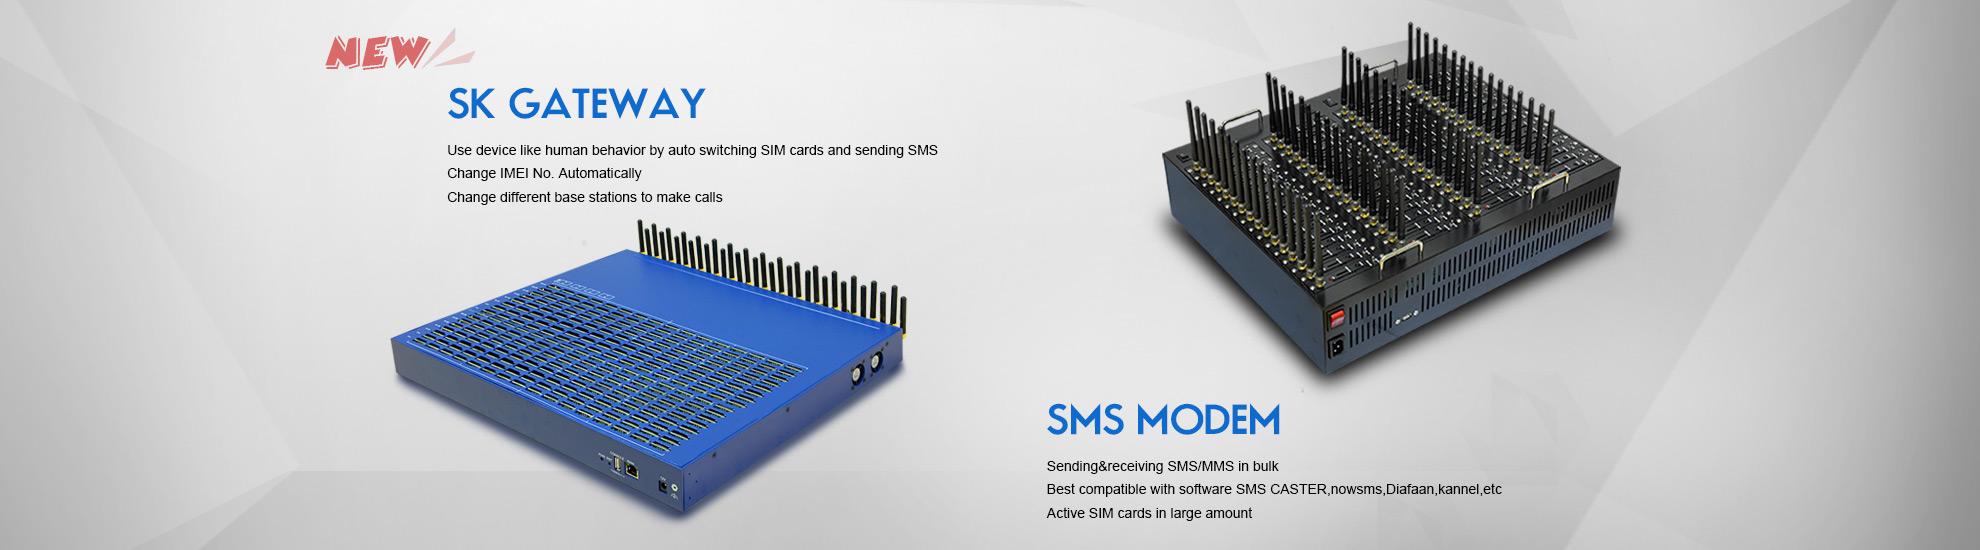 SMS Modem